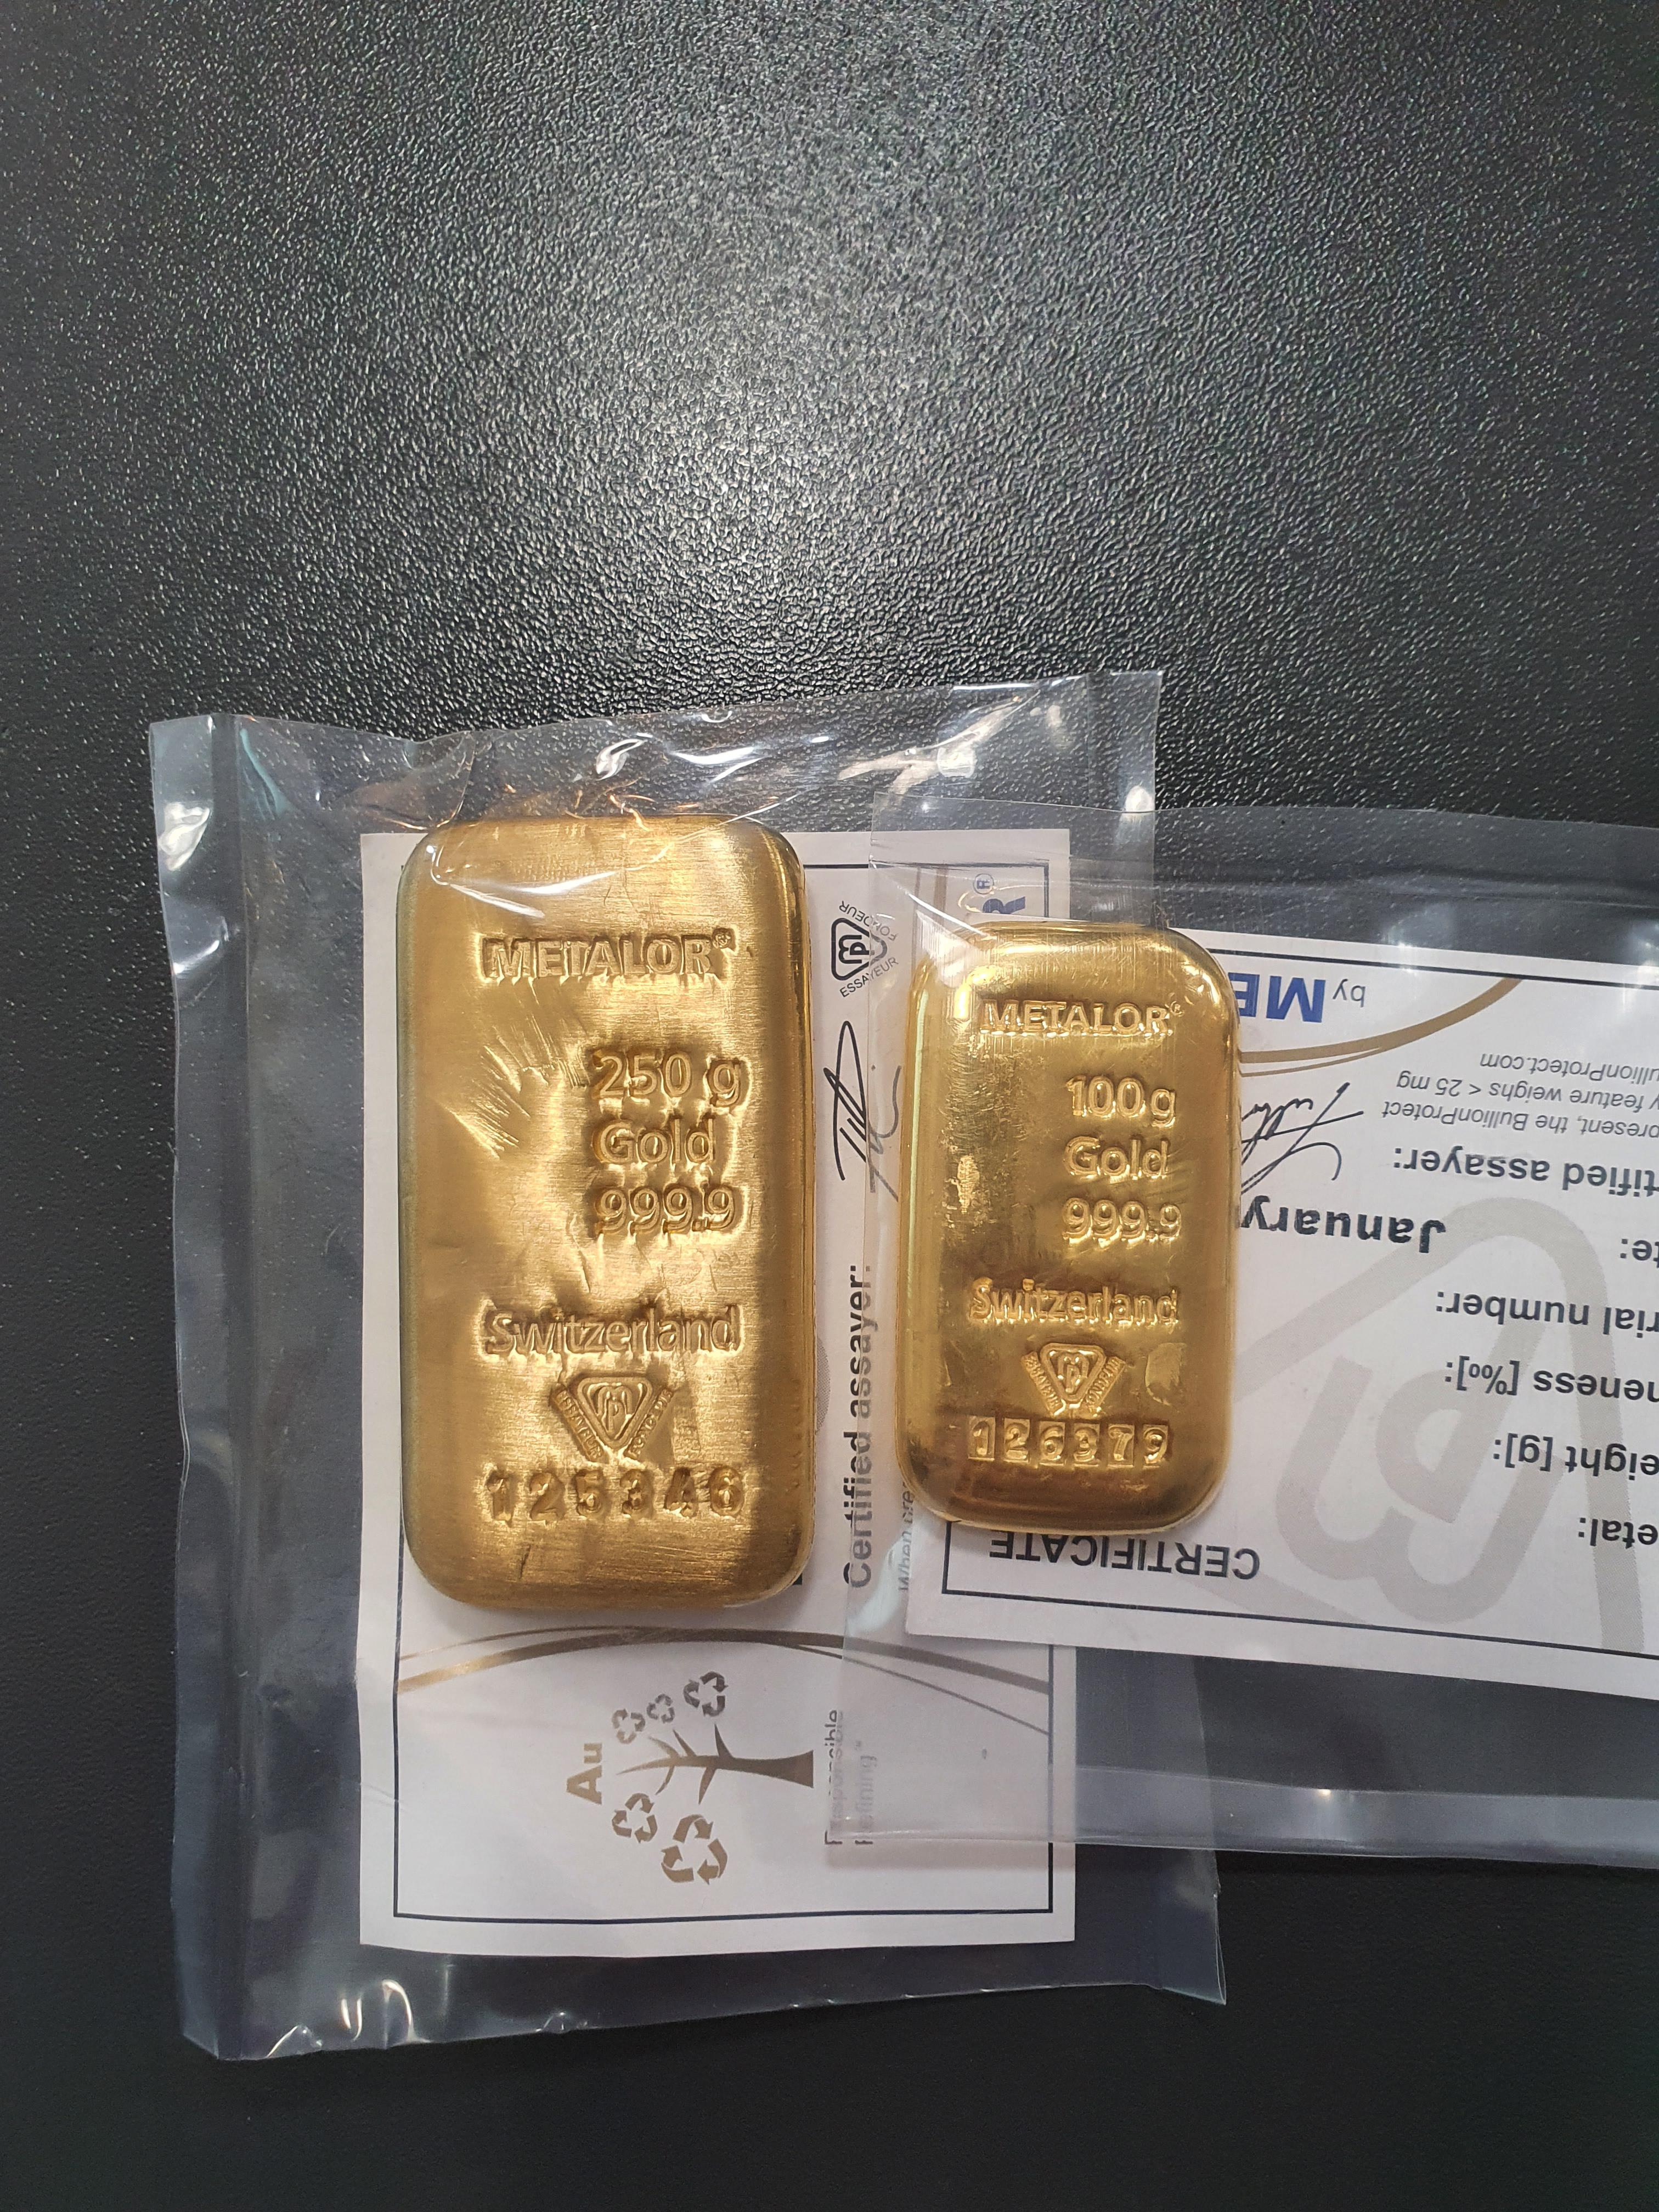 Gold Bar Size Comparison : comparison, Somebody, Asked, Comparison, Metalor, Bars., Would, About, Times, Bigger..